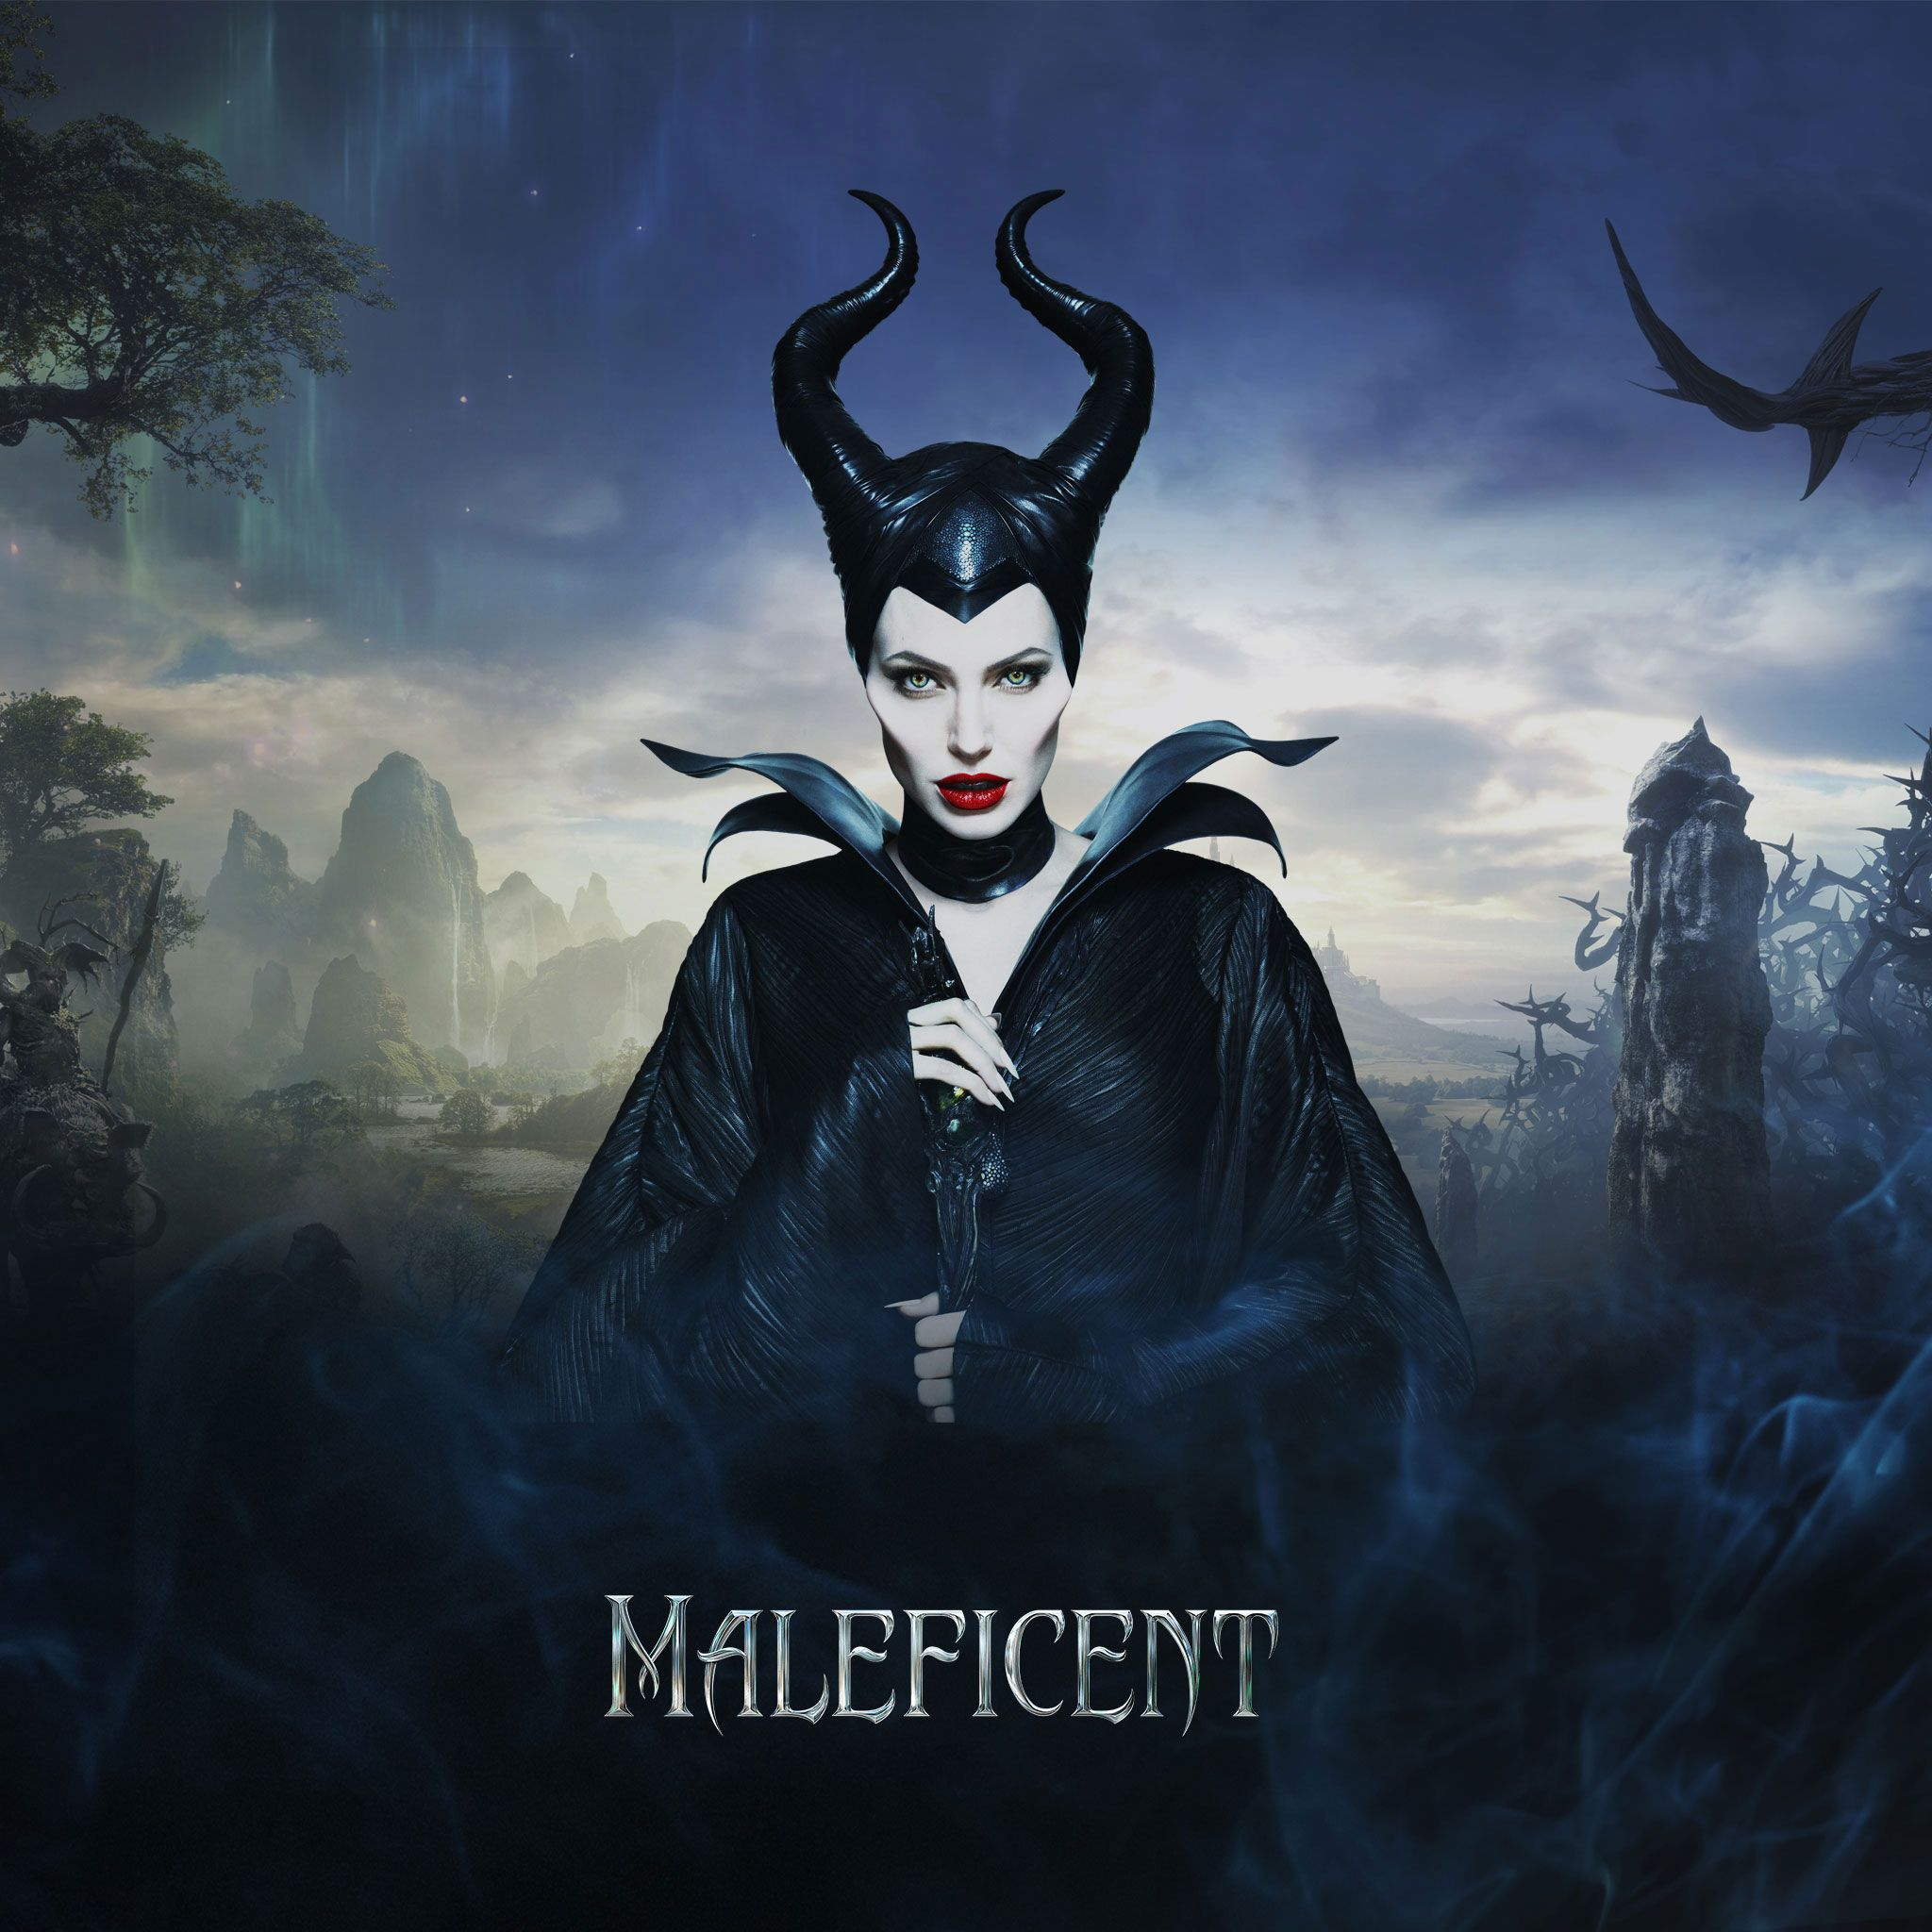 maleficent 2014 diaval maleficent ipad wallpaper Maleficent